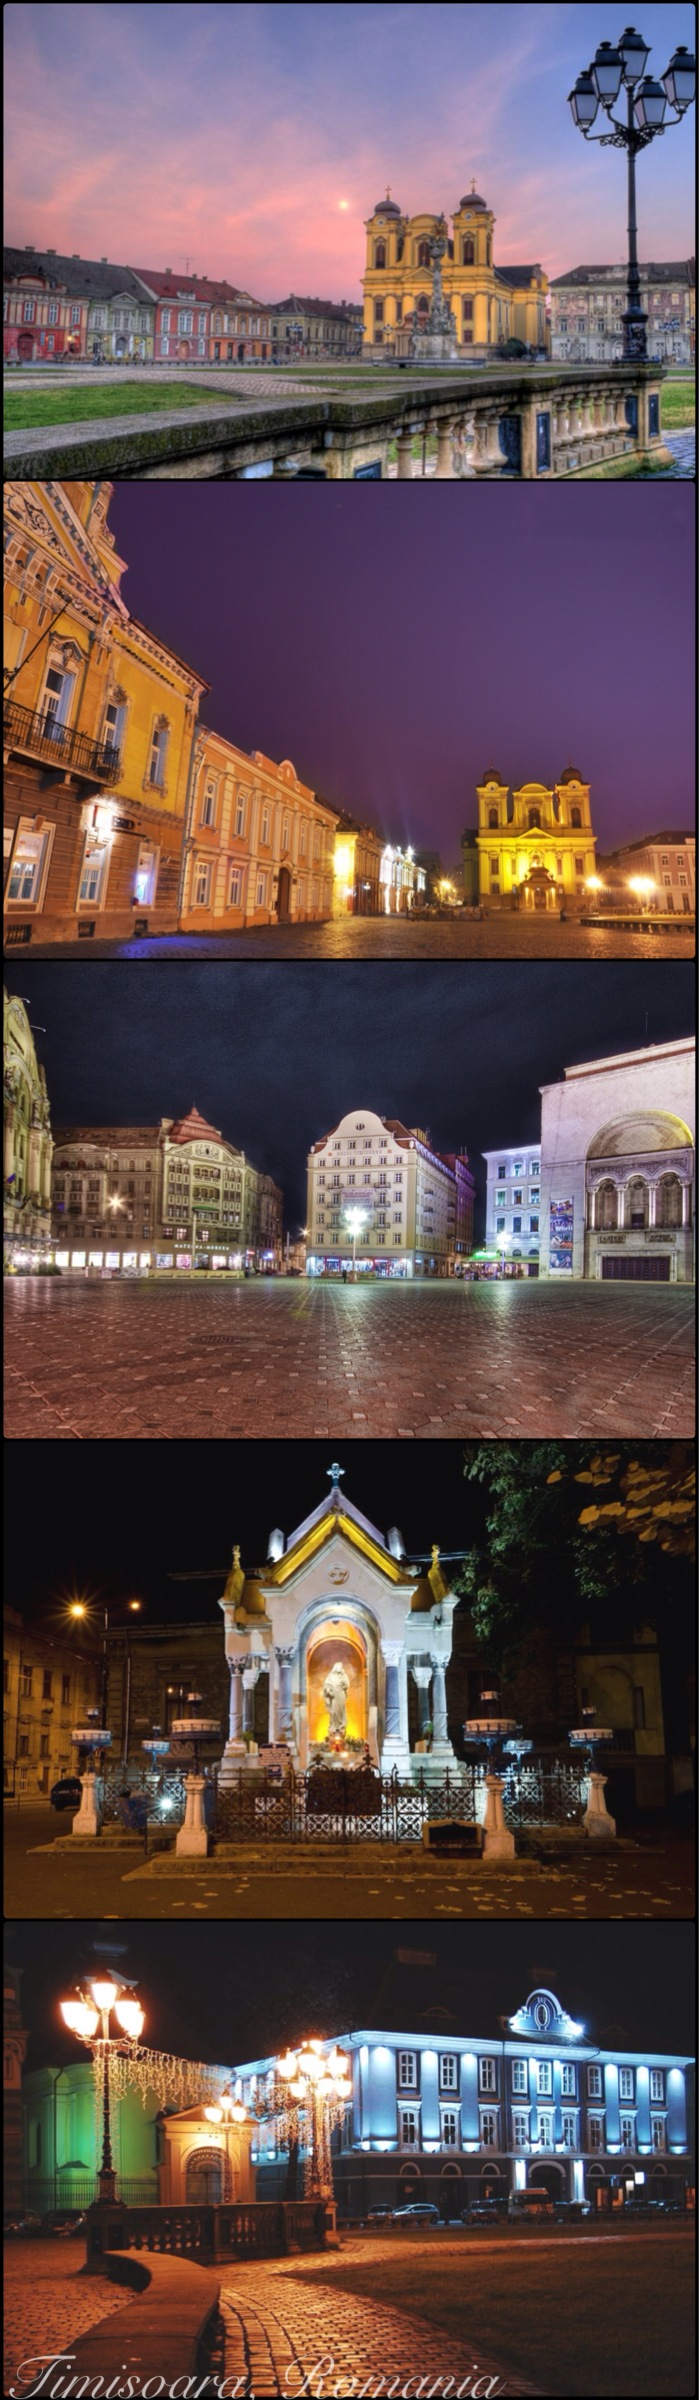 Romania postcard images